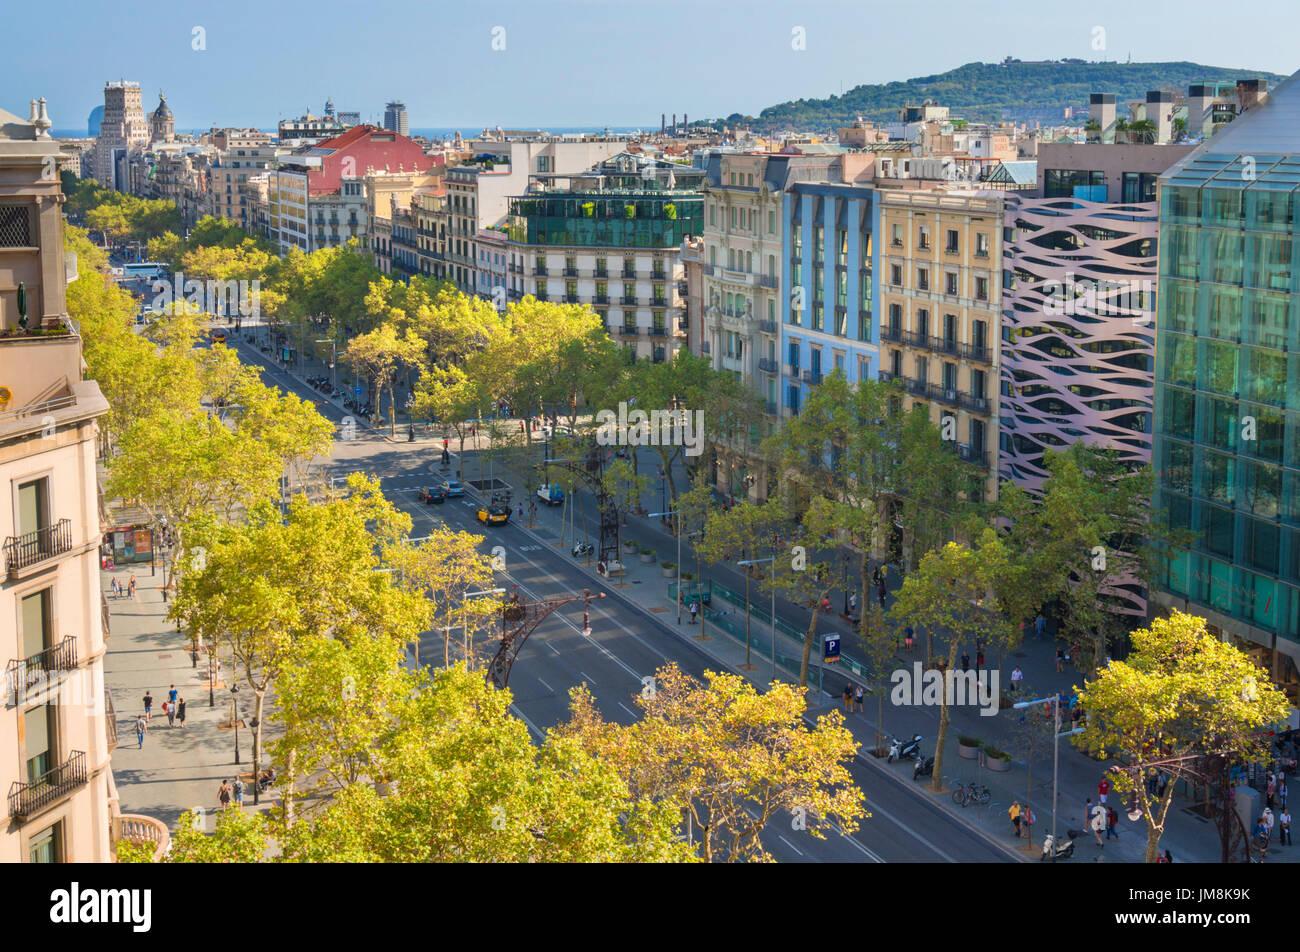 Barcelona España Catalunya ocupado arbolada avenida Passeig de Gràcia Boulevard en el barrio de L'Eixample de Barcelona España ue Europa Cataluña Foto de stock